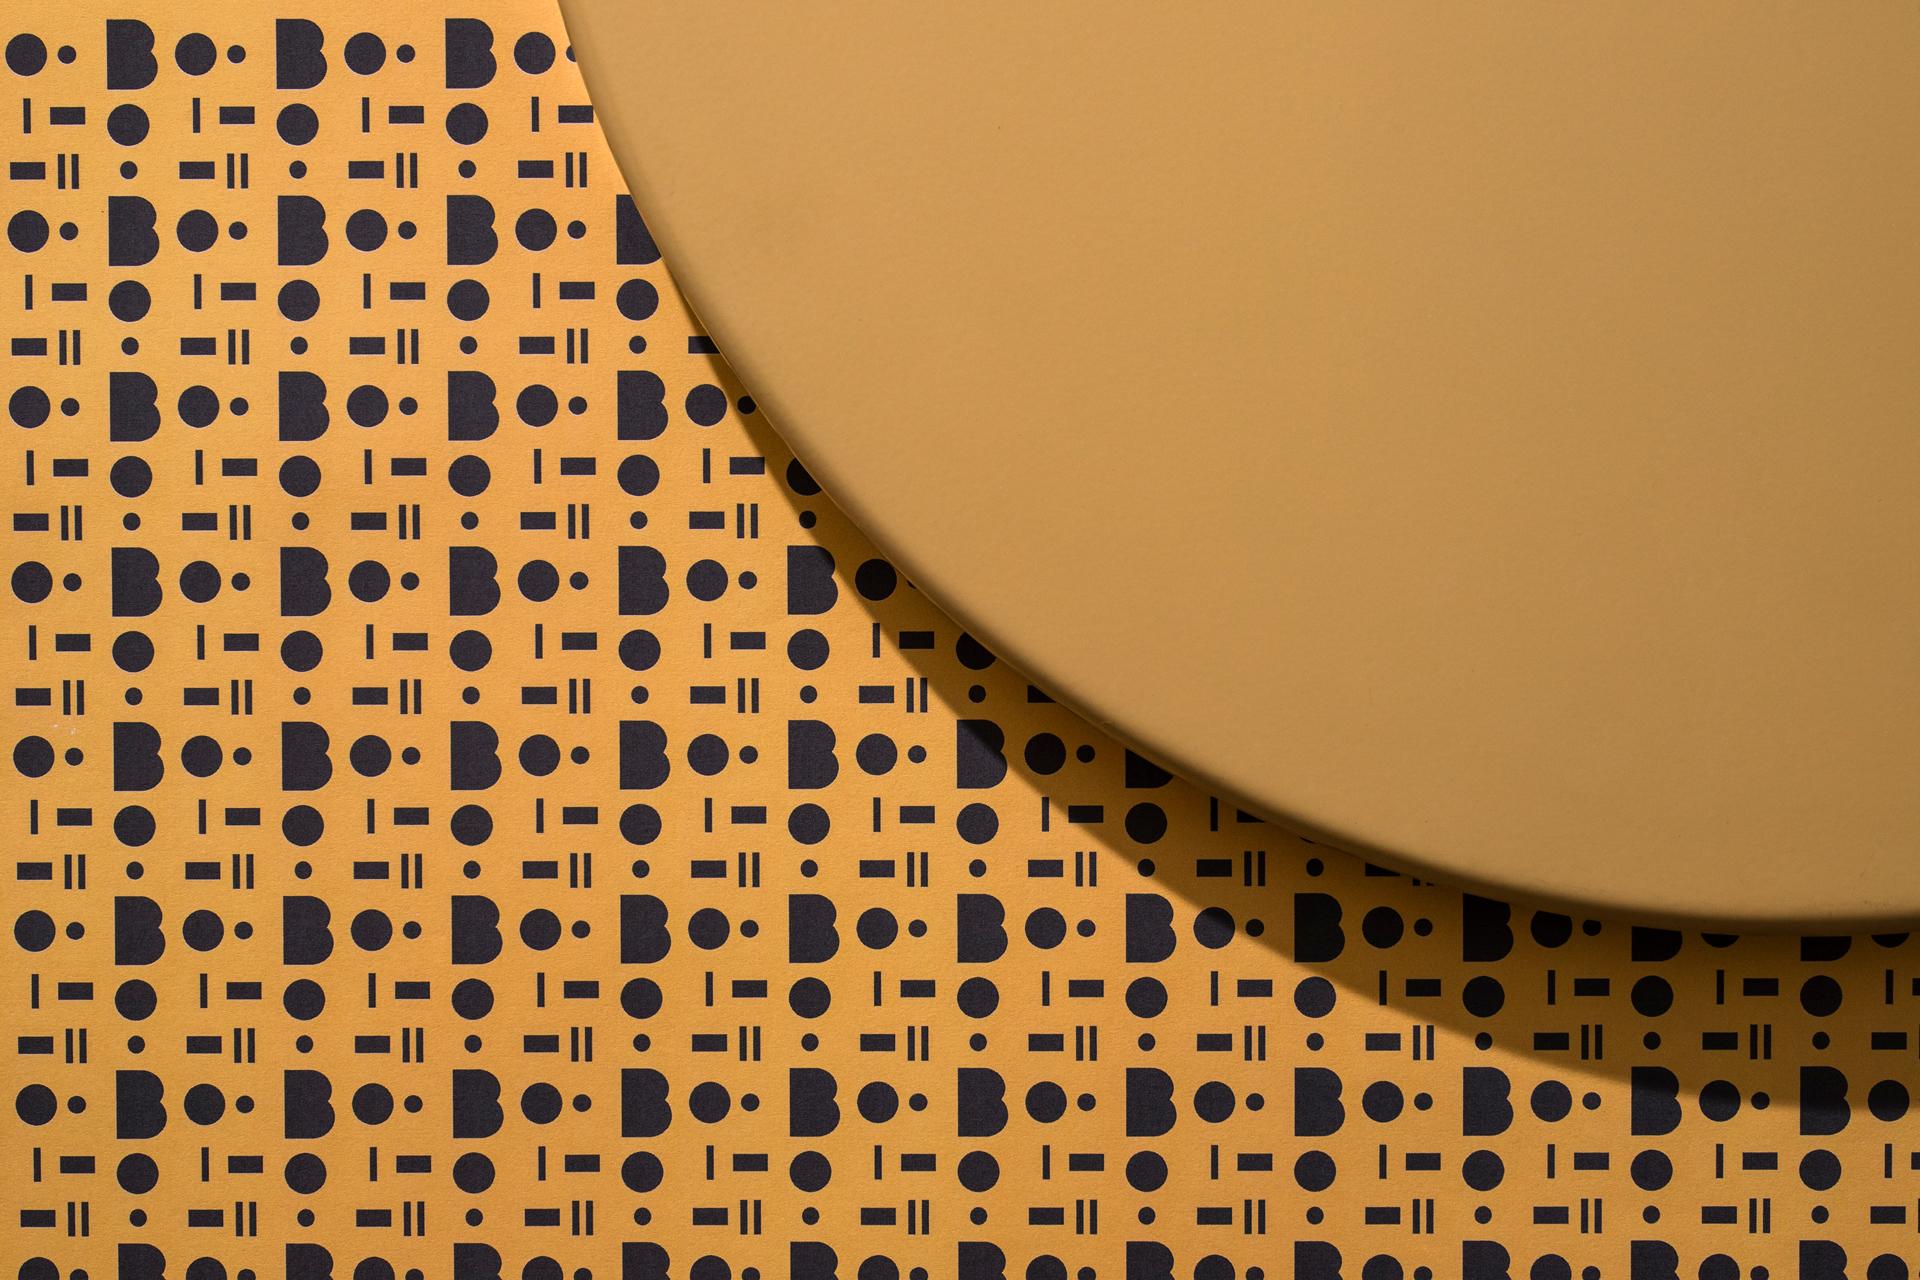 textura-bola-01